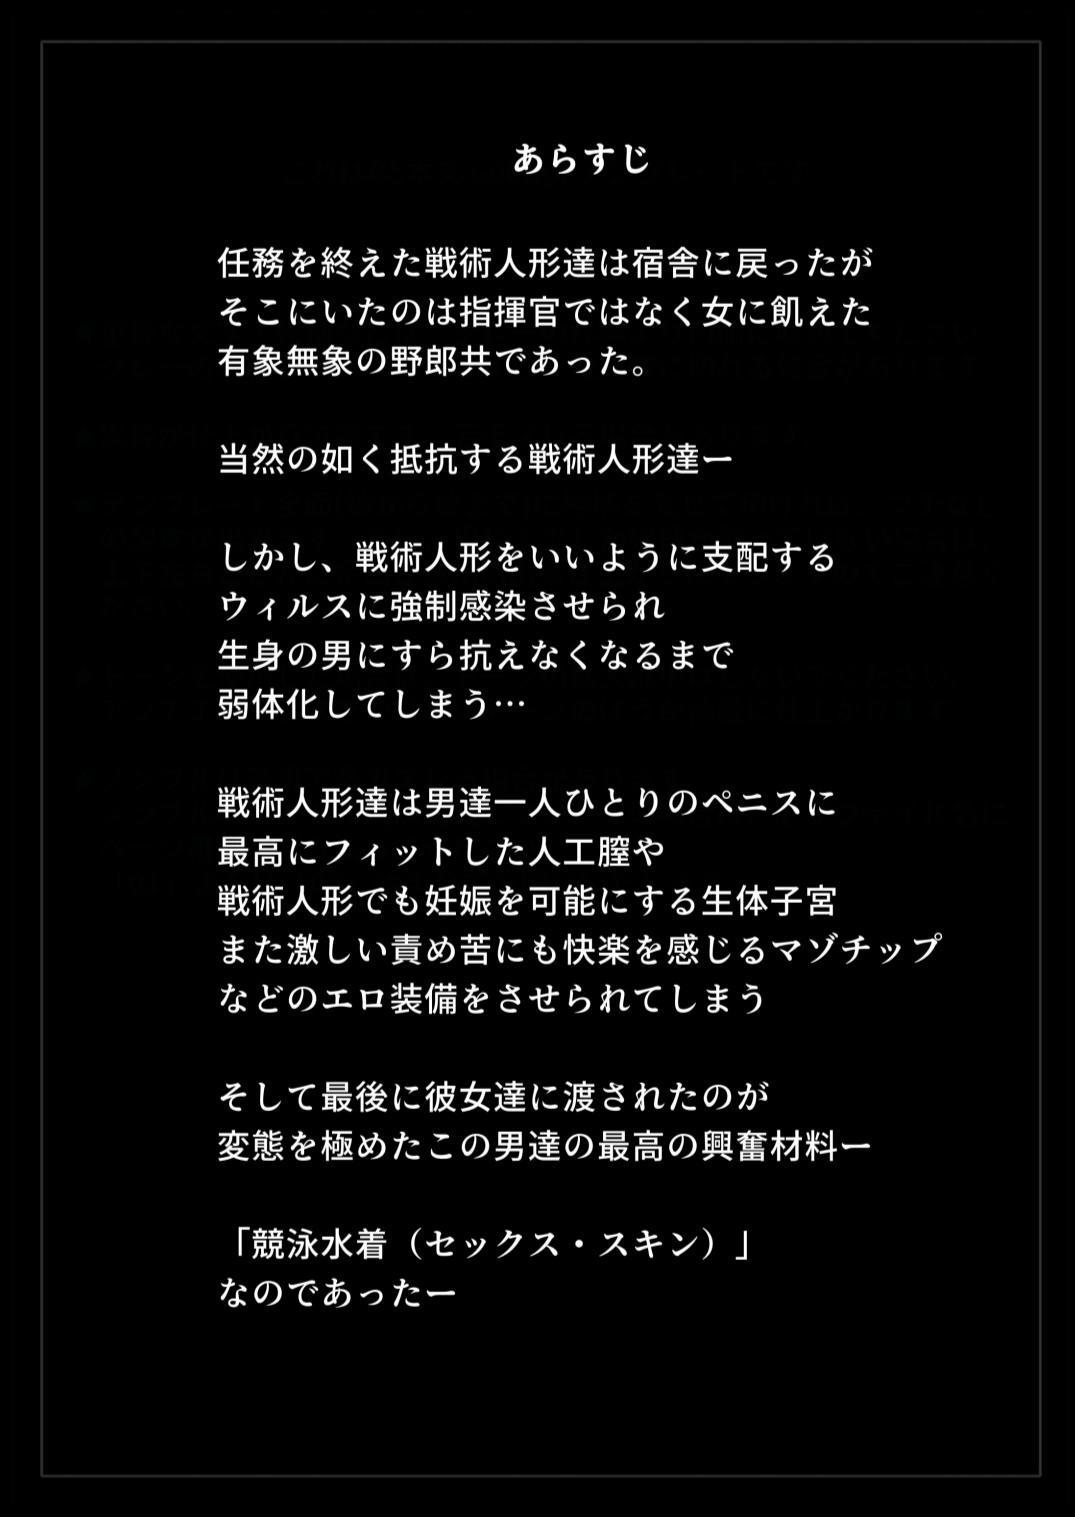 Hoshi 5 Hand Gun ga Sex Skin o Kiserarete Love Doll Mission o Shiirrareru Hon 1